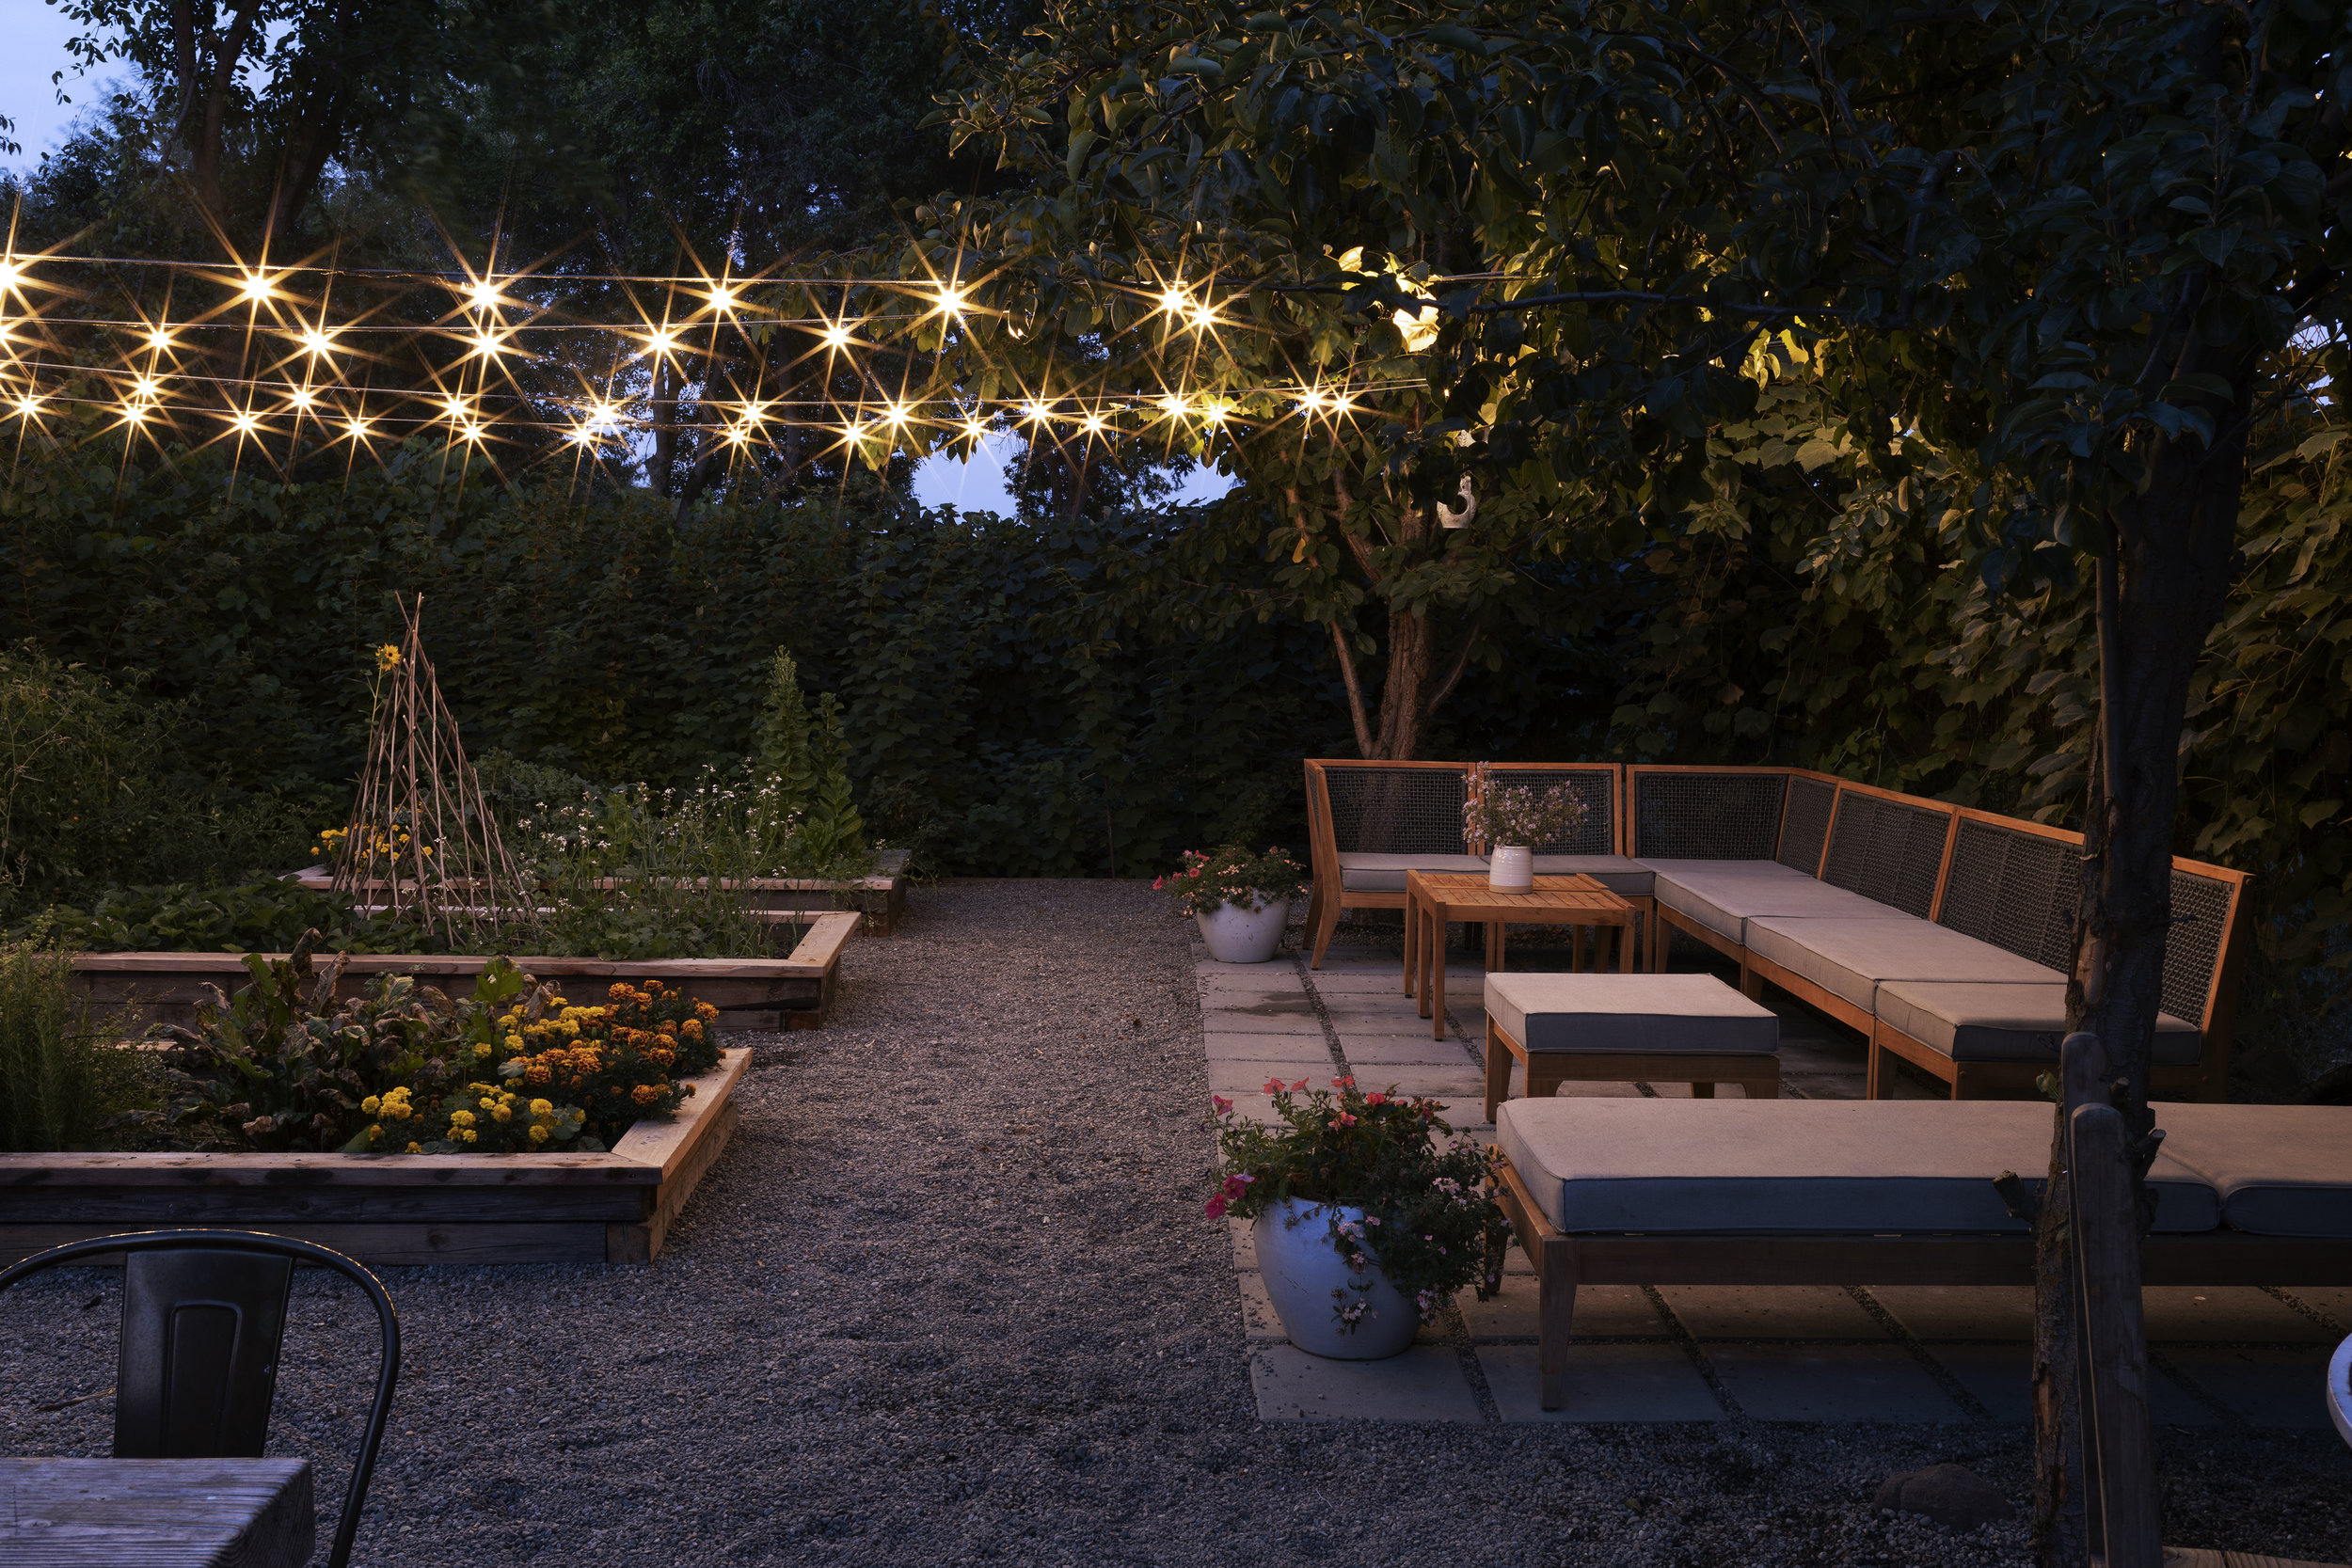 The Grit and Polish - Farmhouse Garden at Night 4.jpg